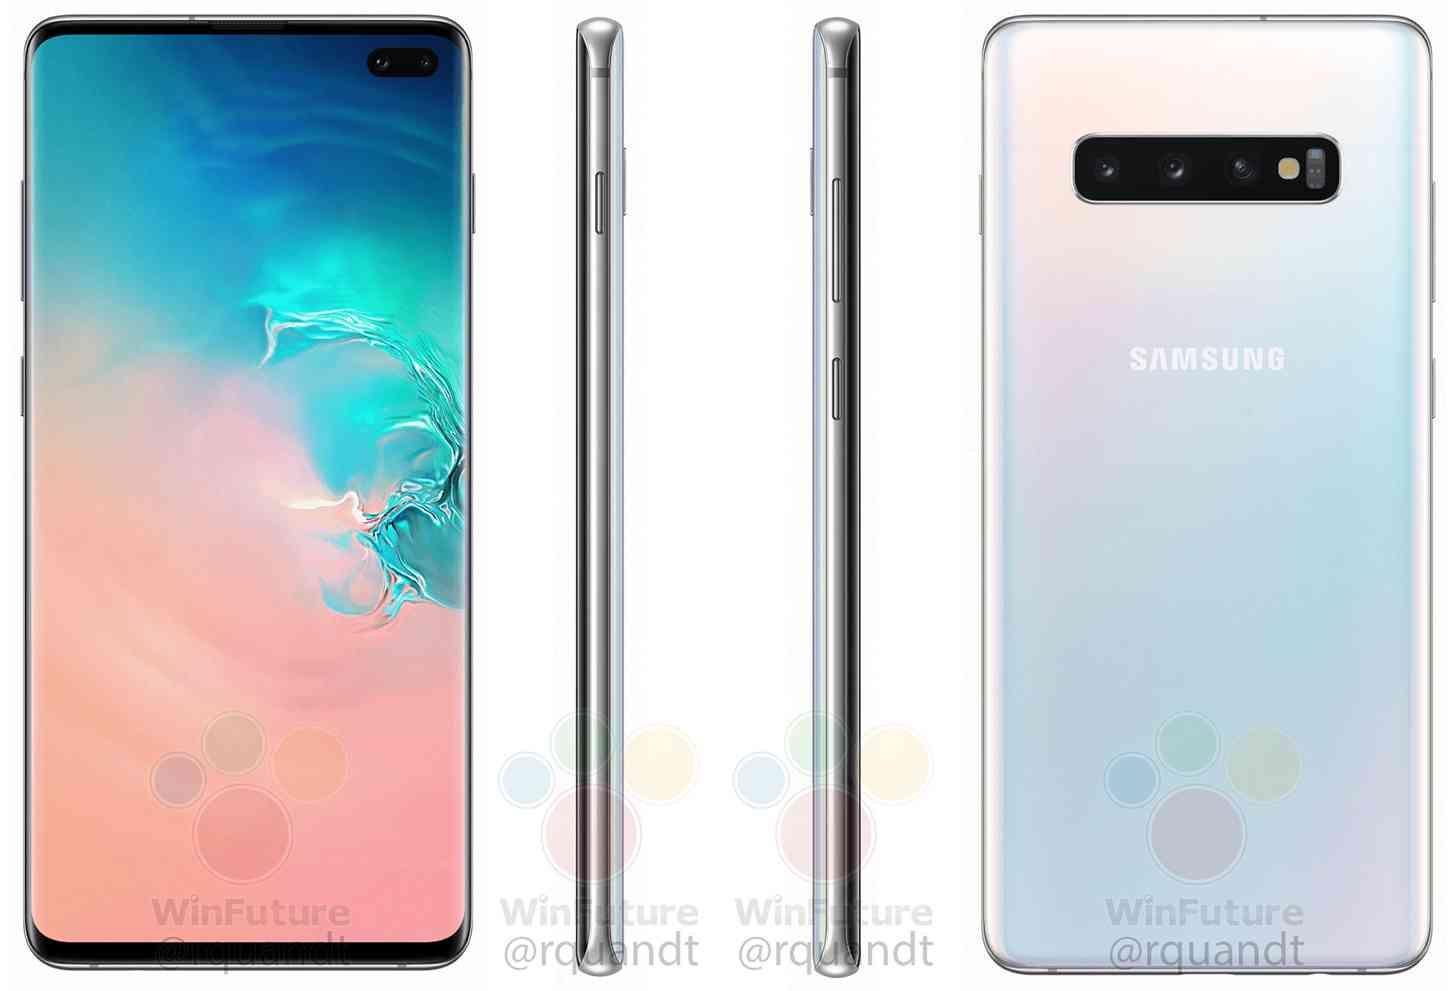 Samsung Galaxy S10+ renders